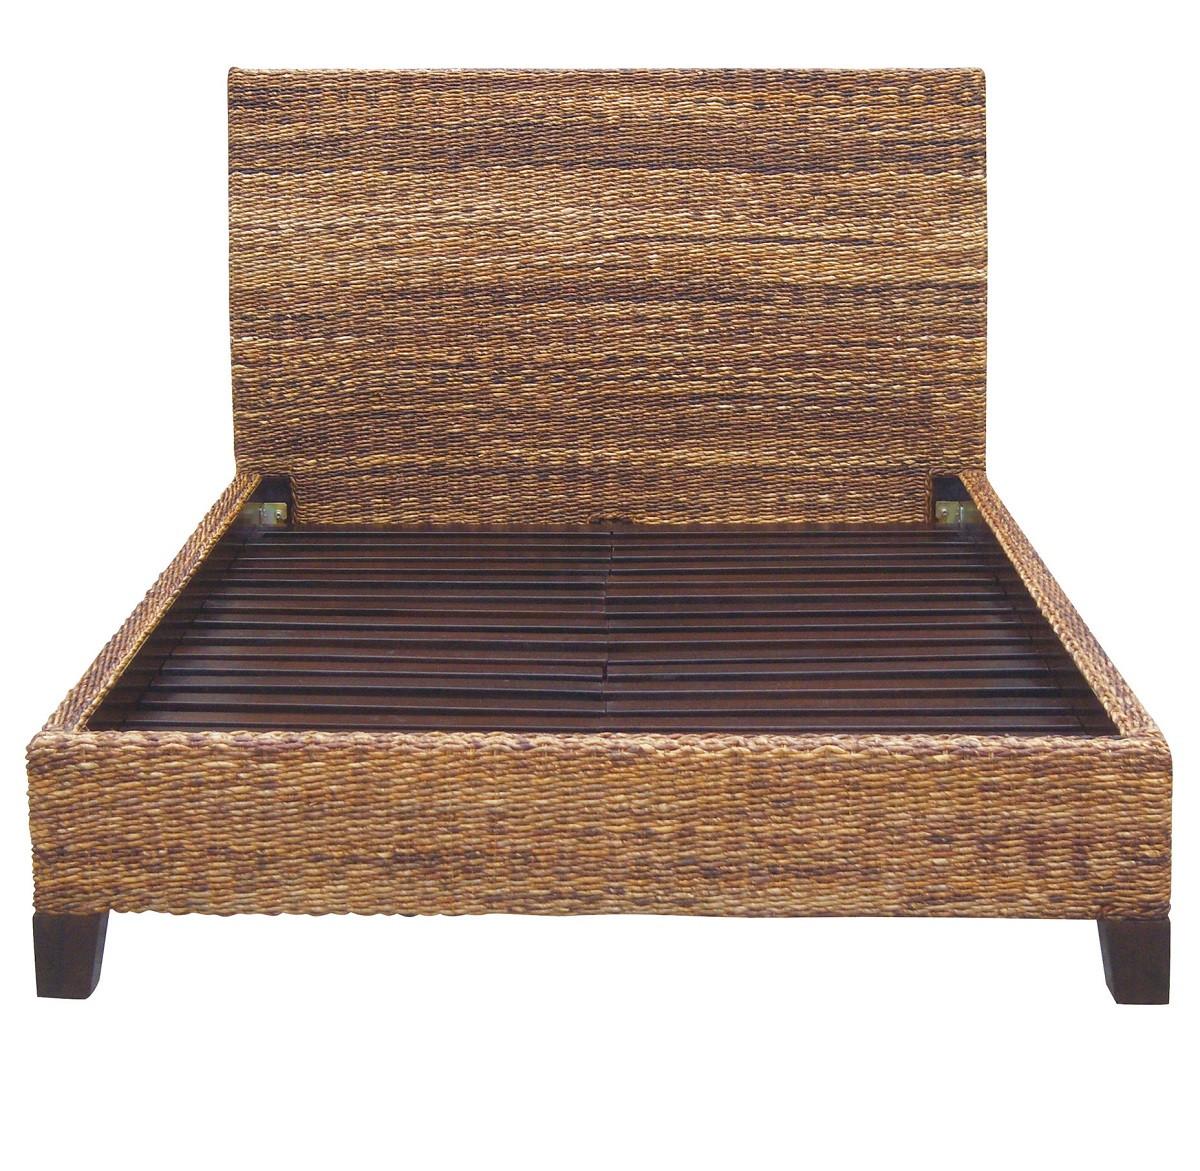 lanai banana leaf woven rattan queen platform bed frame - Rattan Bed Frame